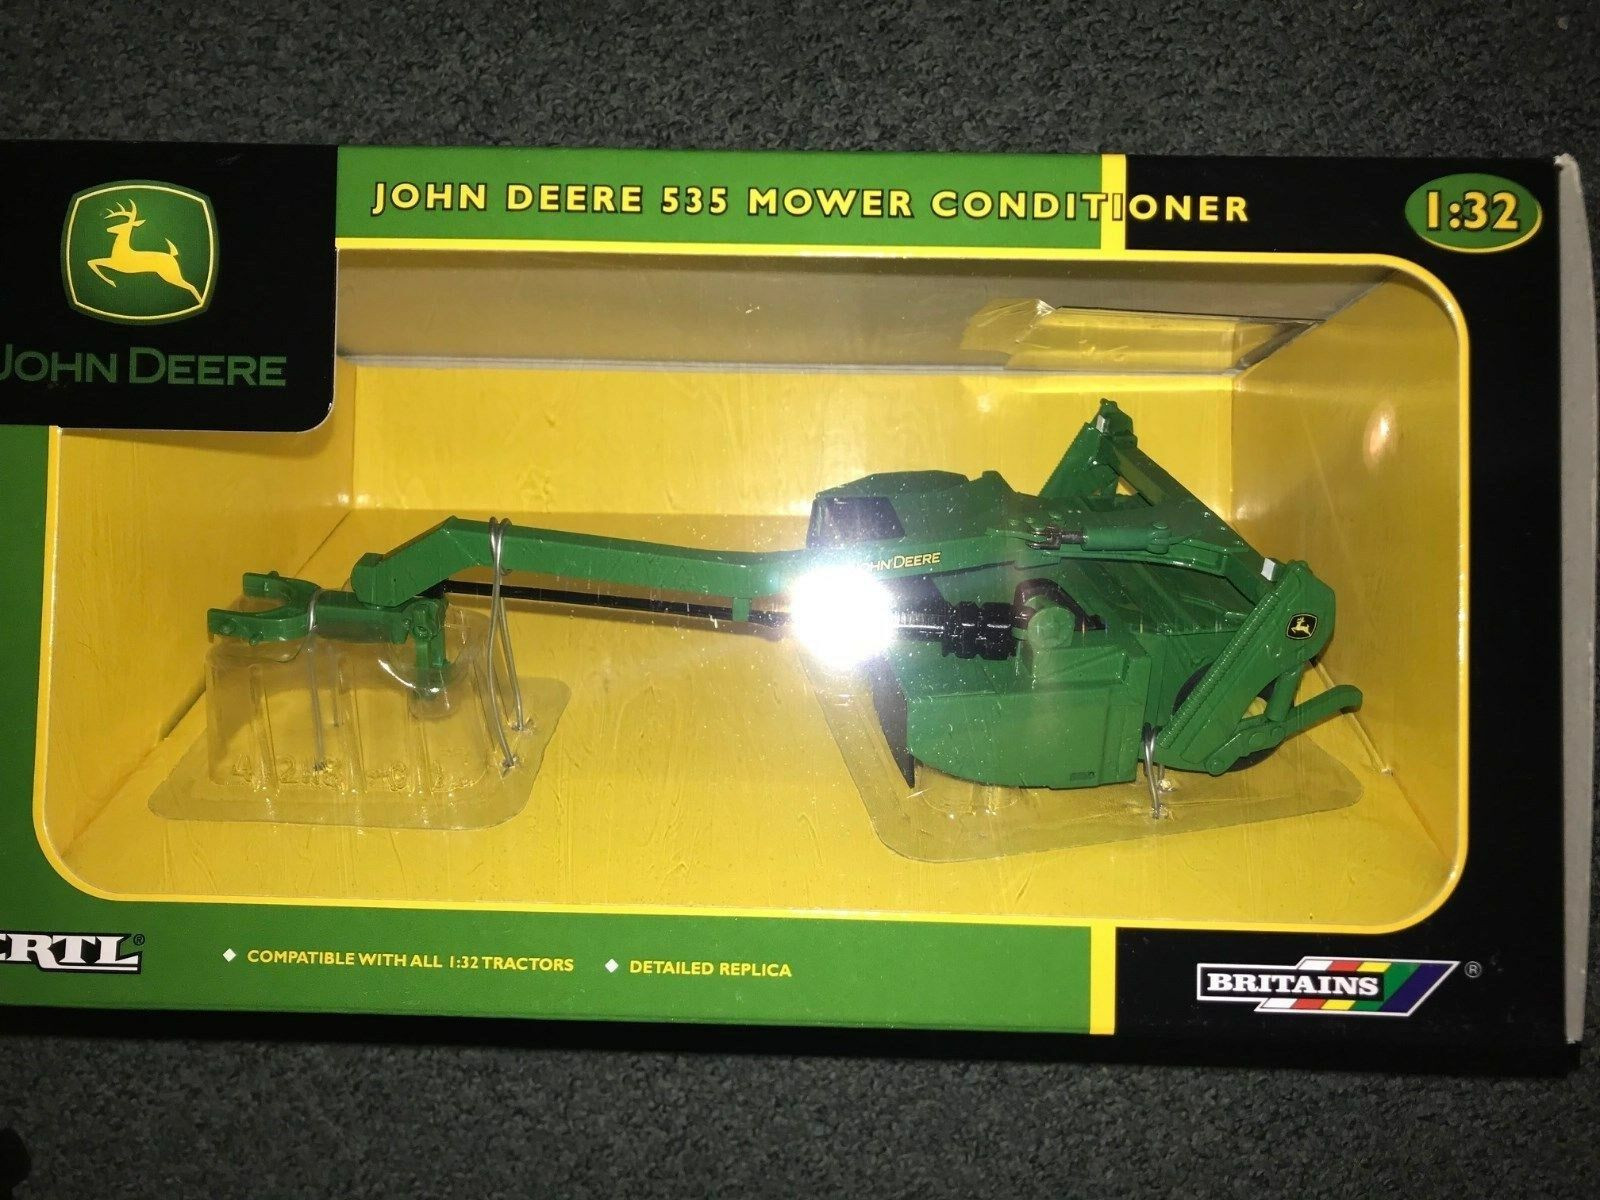 42118 1 32 Britains John Deere 535 Mower Conditioner